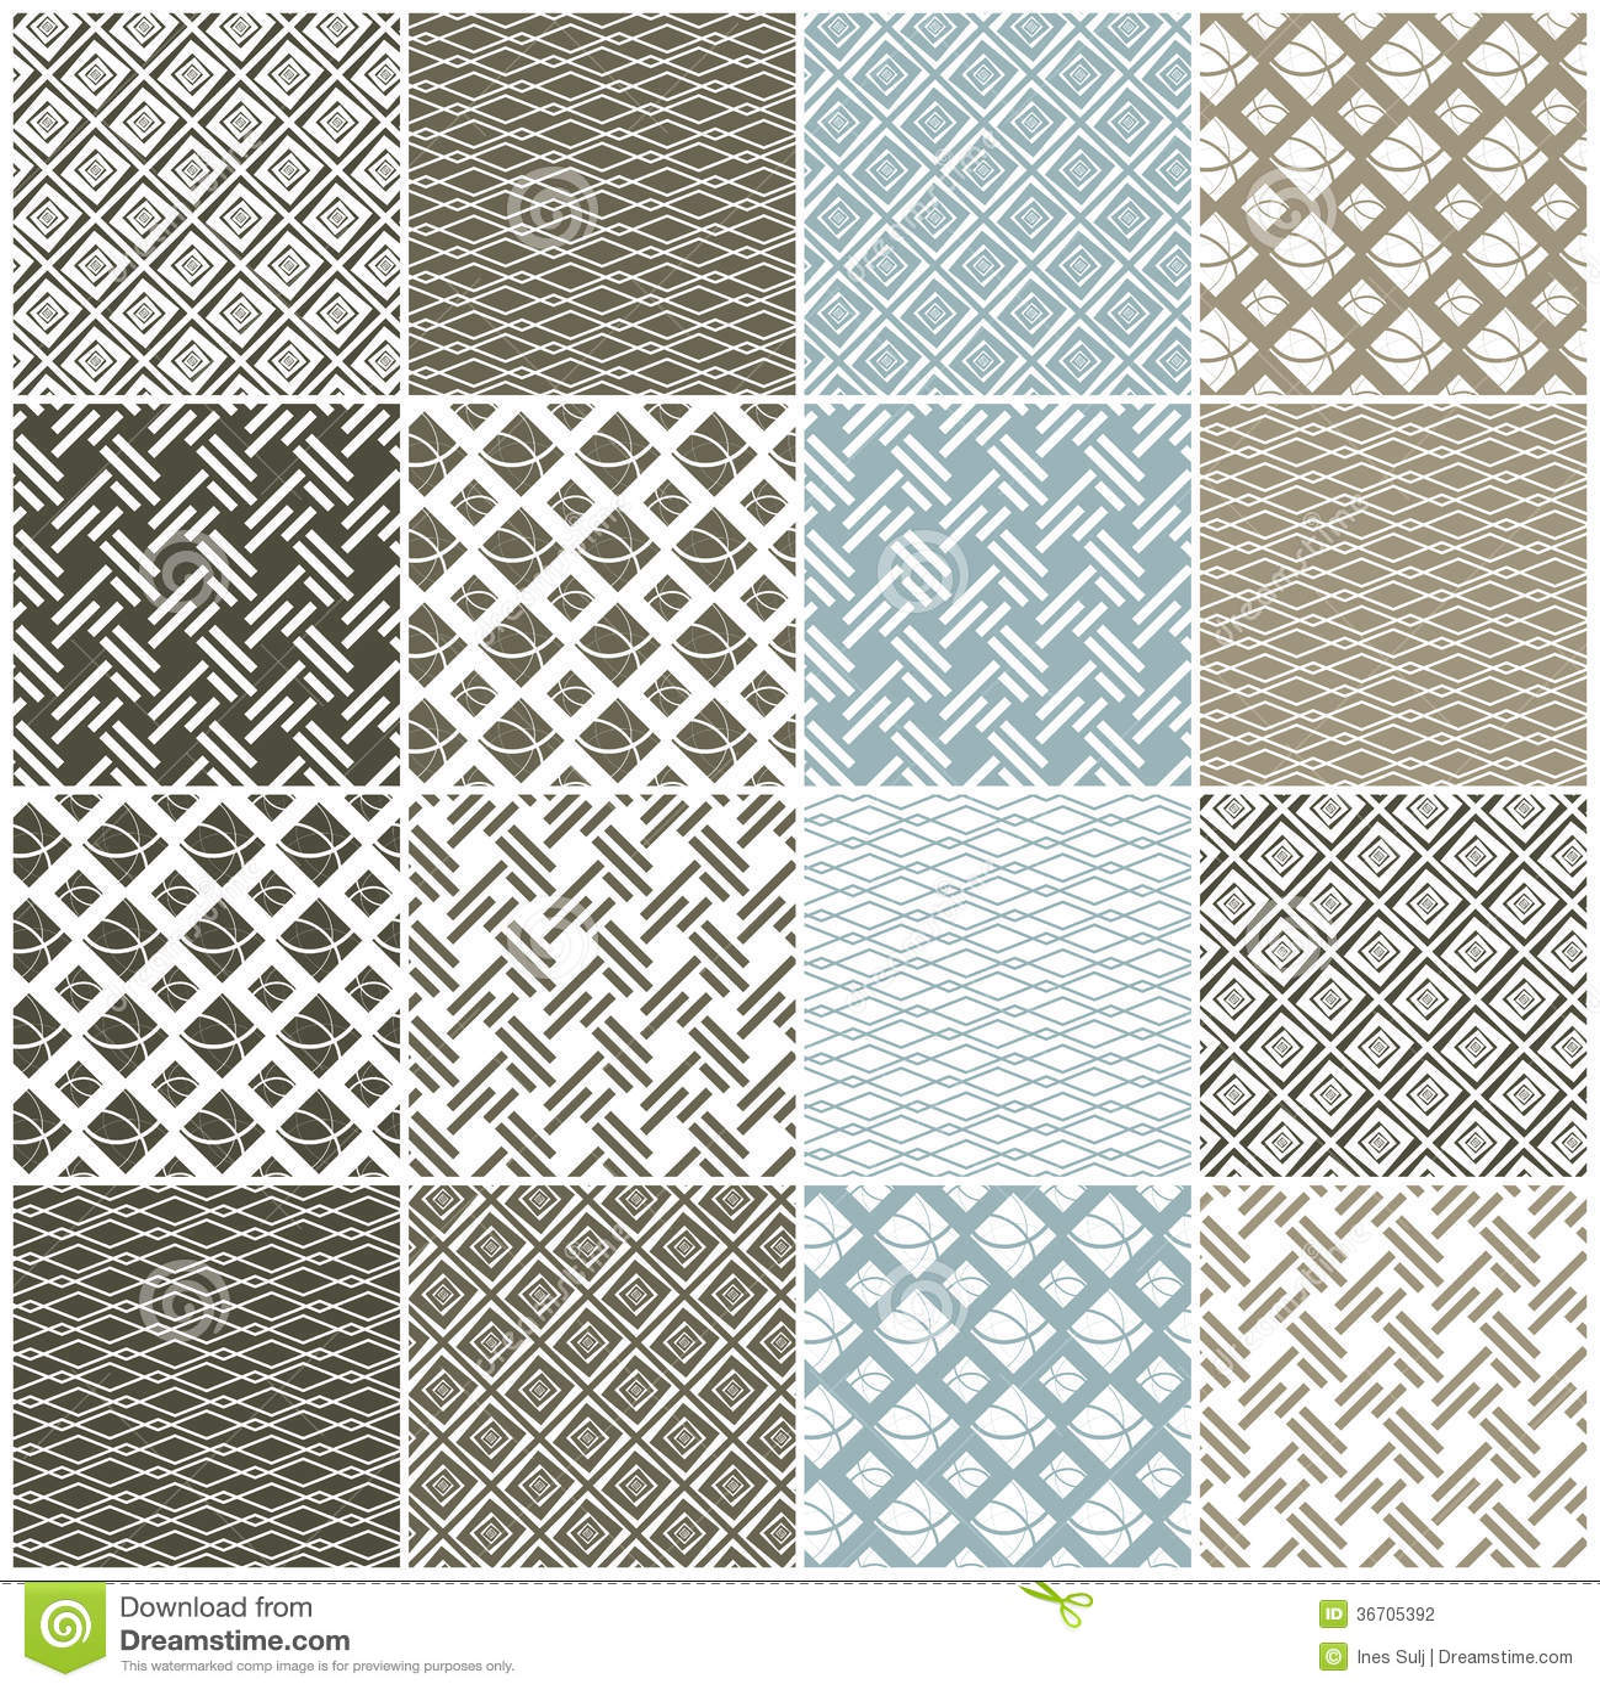 Geometrische naadloze patronen: vierkanten, lijnen, golven